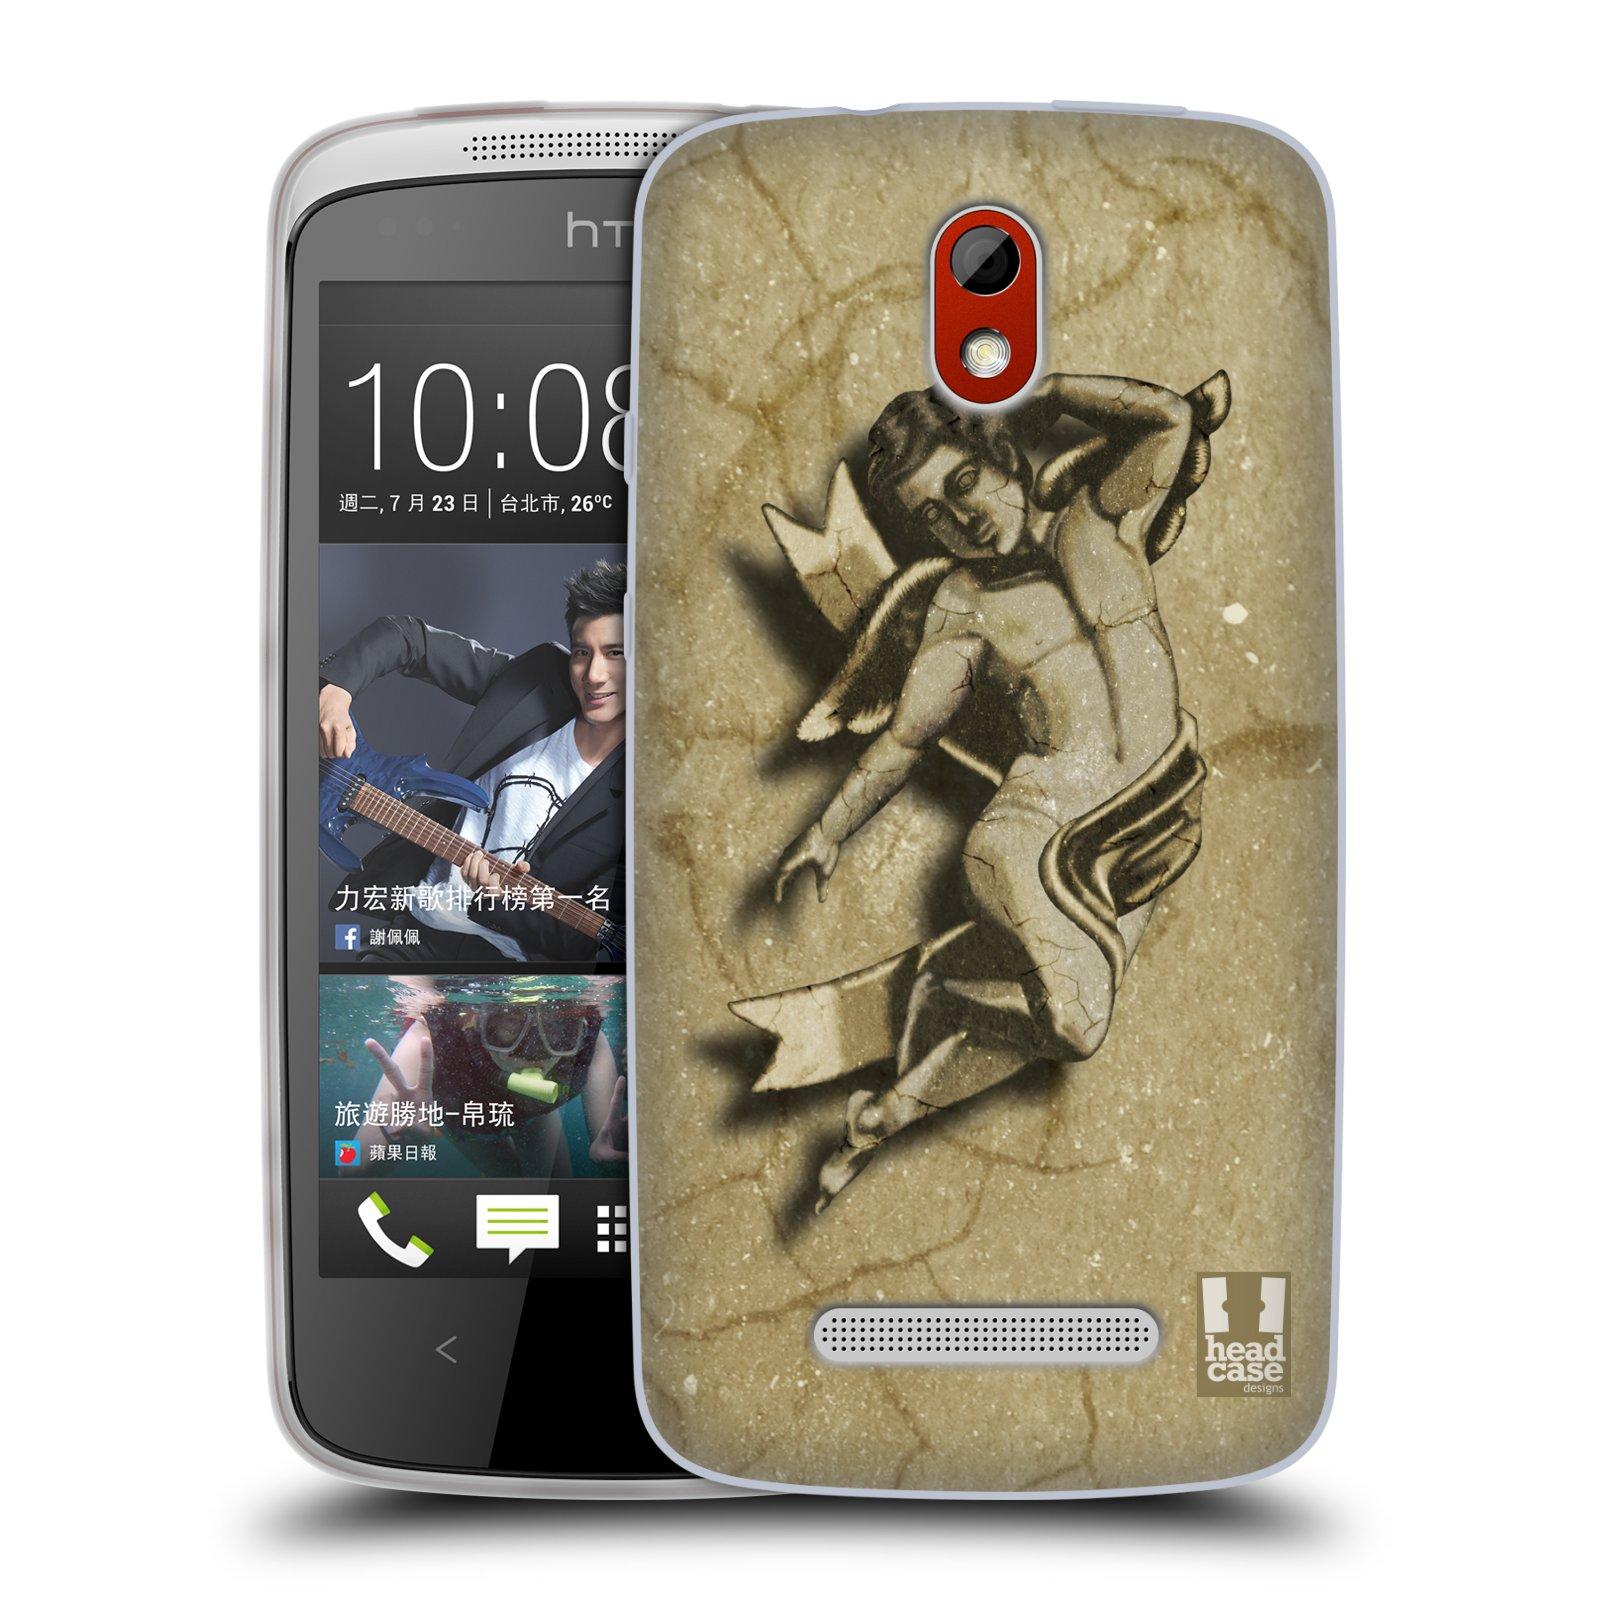 HEAD CASE silikonový obal na mobil HTC DESIRE 500 vzor Andělé z kamene LAYLAND